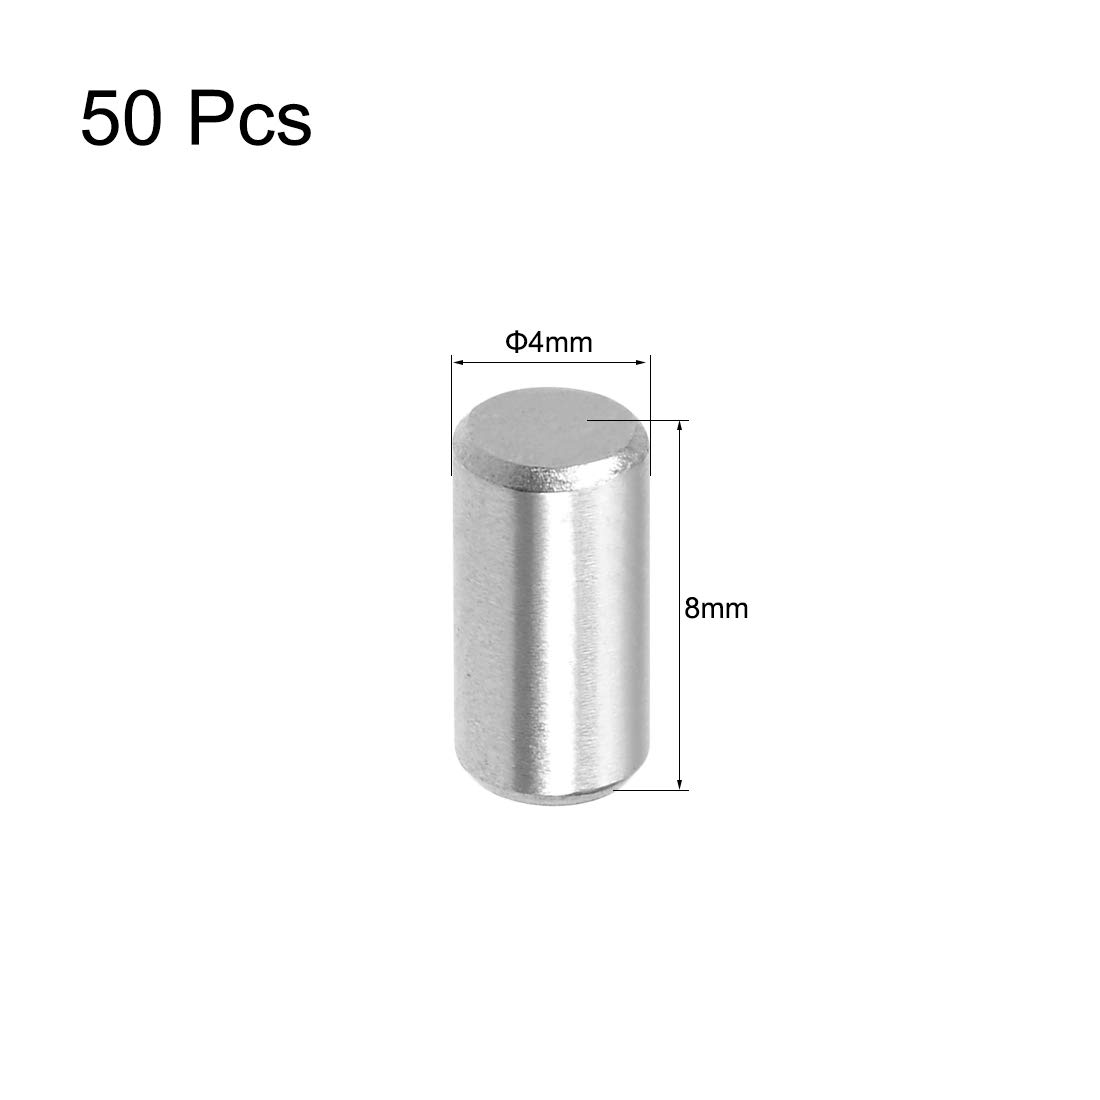 sourcing map 100pcs 2.5mm x 14mm Pasador 304 Estante de Acero Inoxidable Pin Elementos de sujeci/ón